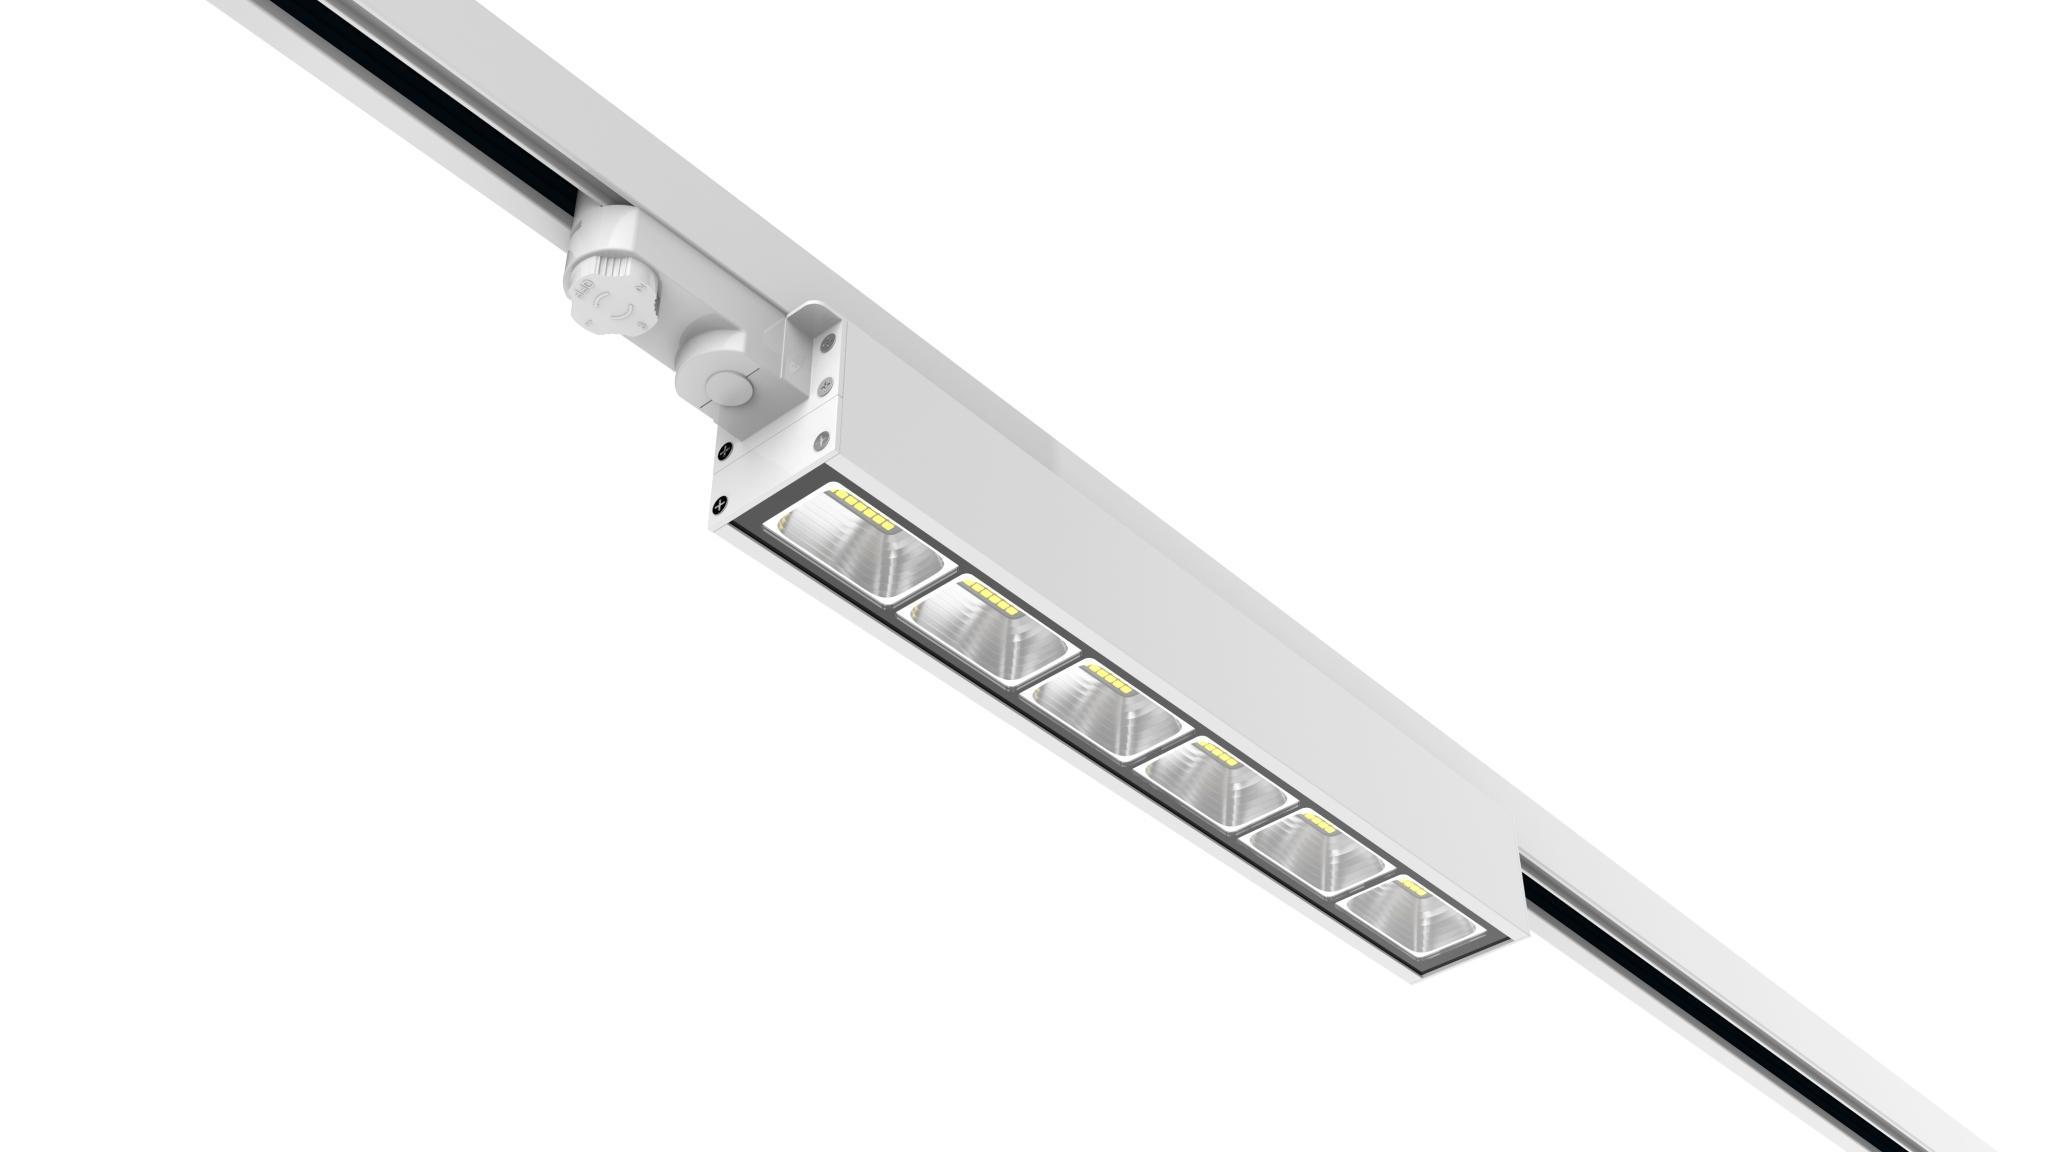 Dali dimming Linear LED Track Light 40w 130lm/w 3 Circuits 5